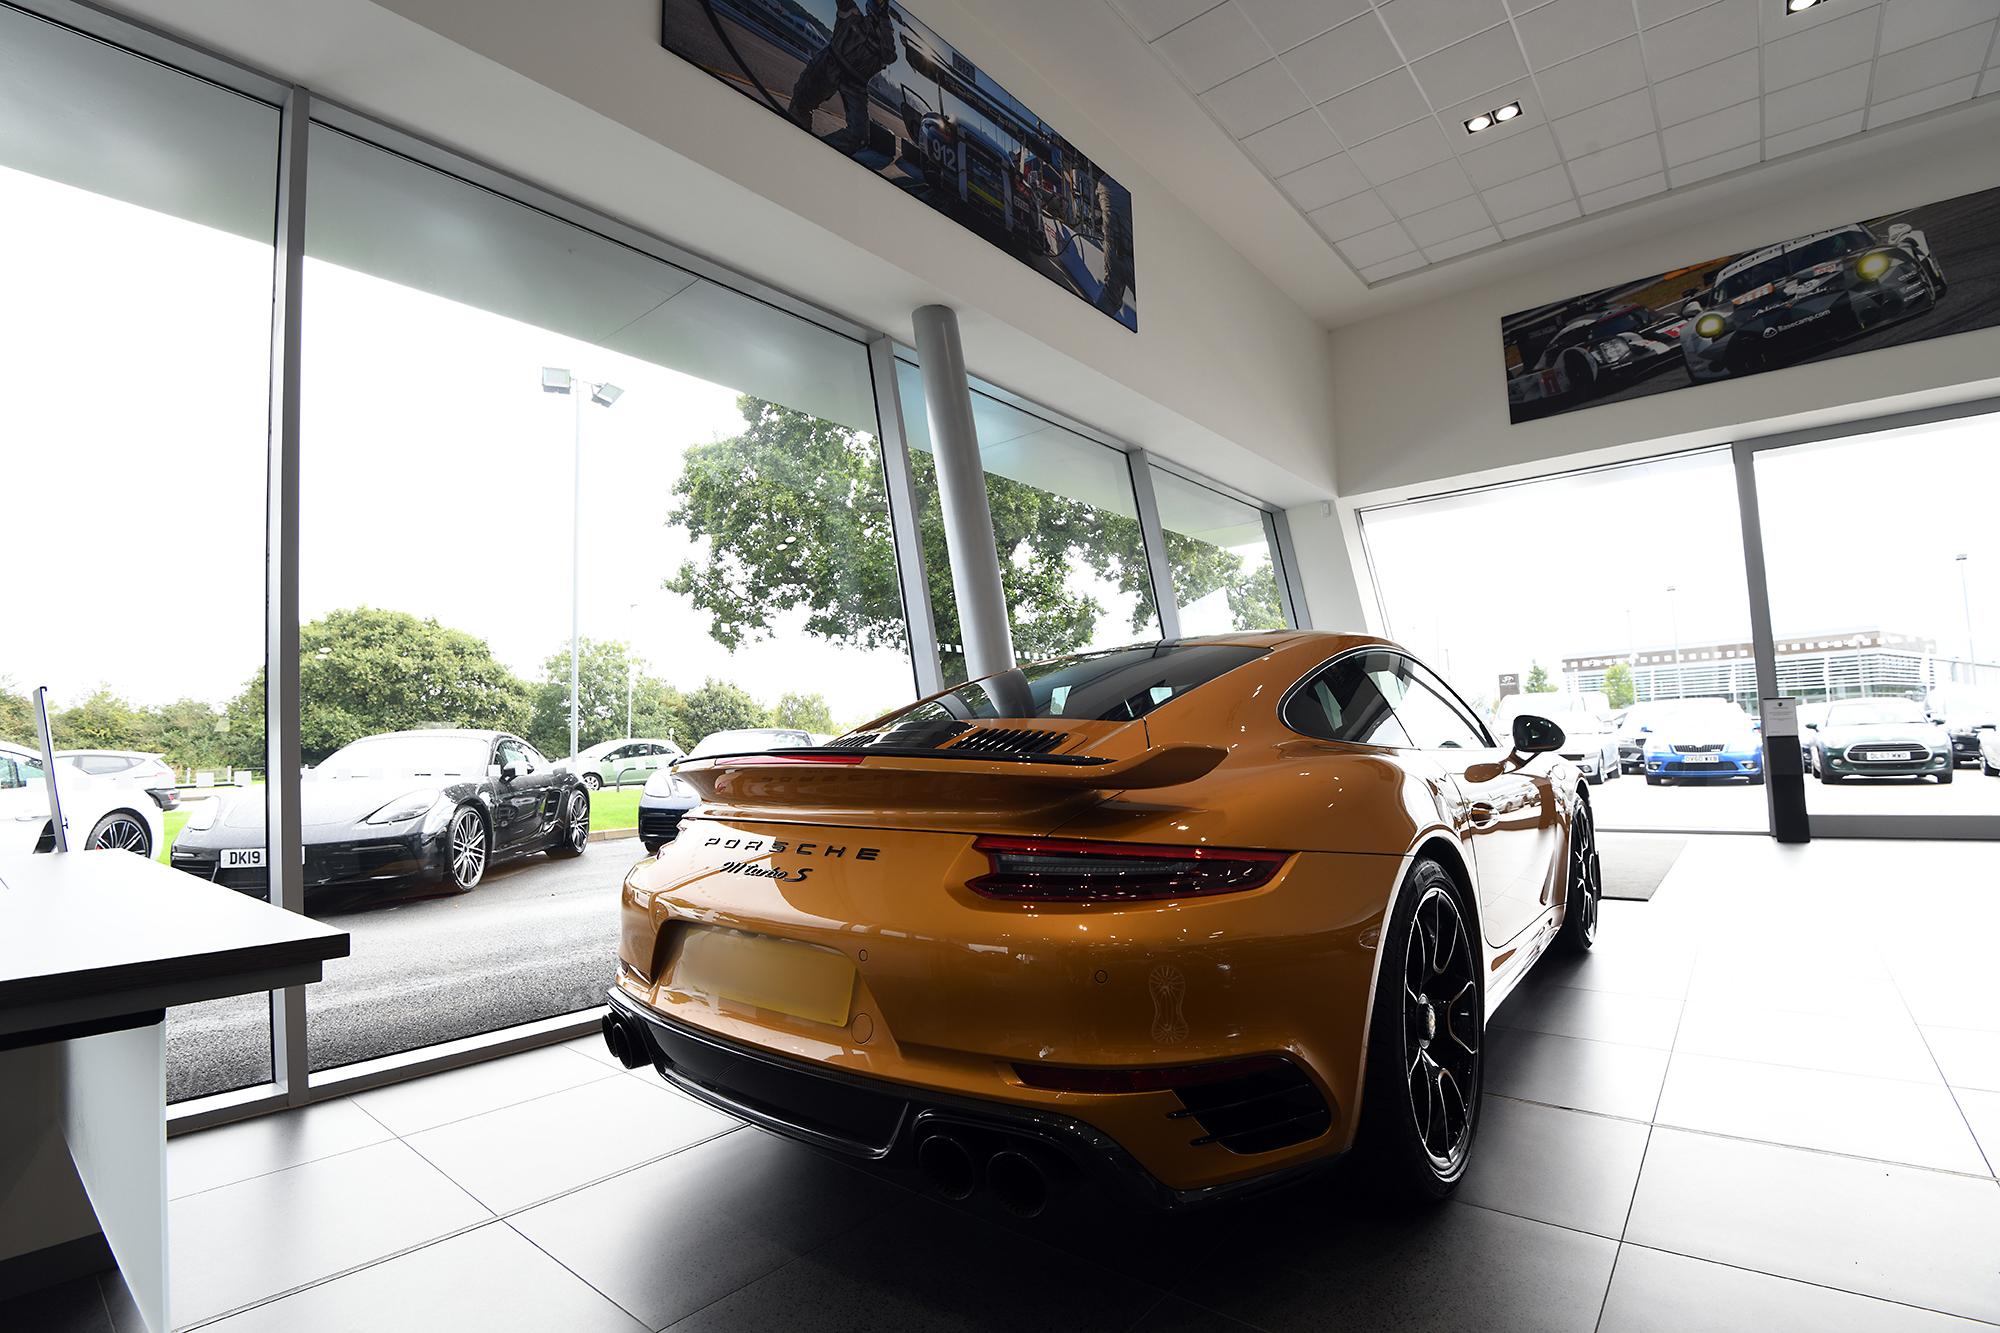 Traditional photographic image - Porsche 5